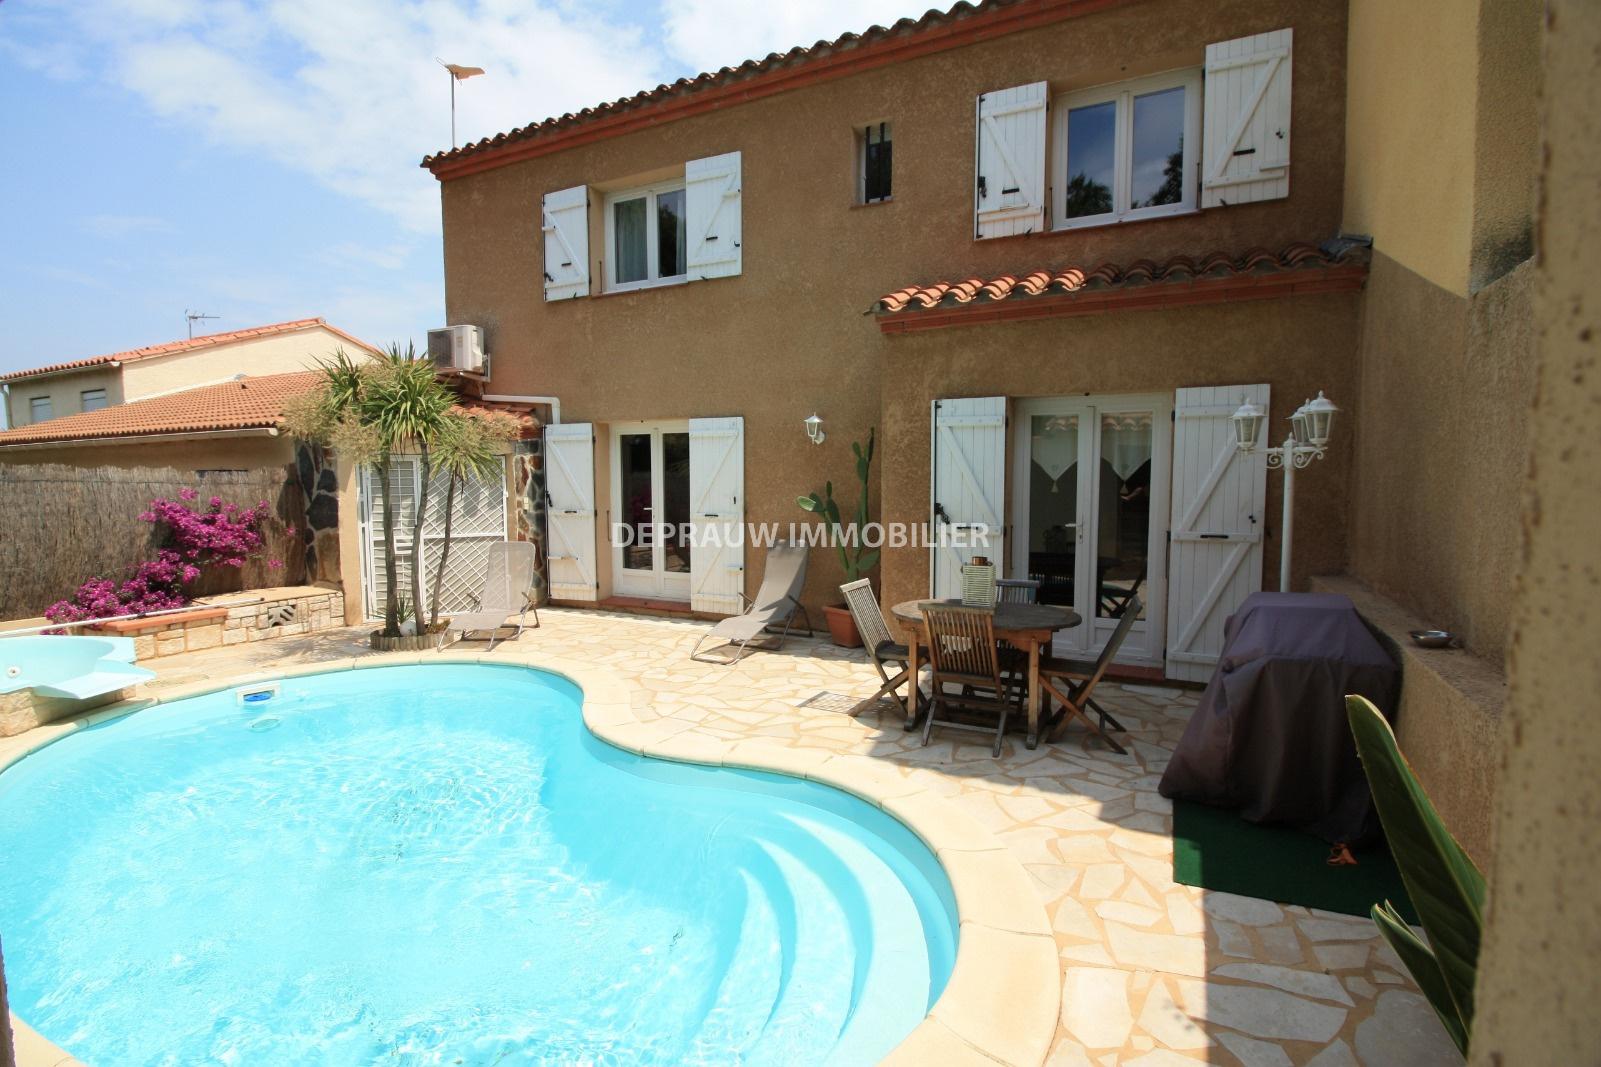 vente perpignan sud villa t5 climatis e avec piscine et. Black Bedroom Furniture Sets. Home Design Ideas